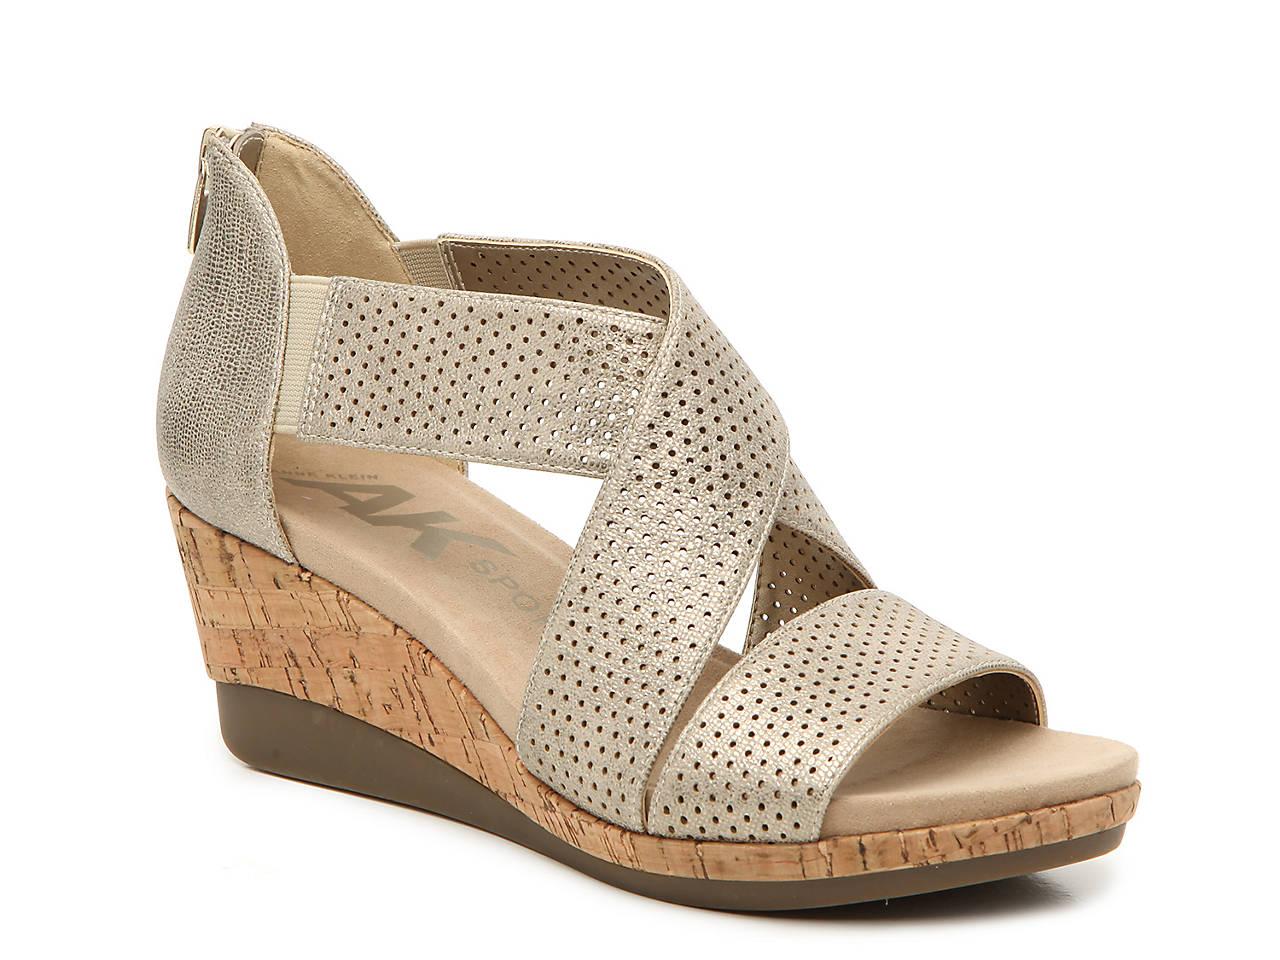 b8c28139994f Anne Klein Sport Poetic Wedge Sandal Women s Shoes